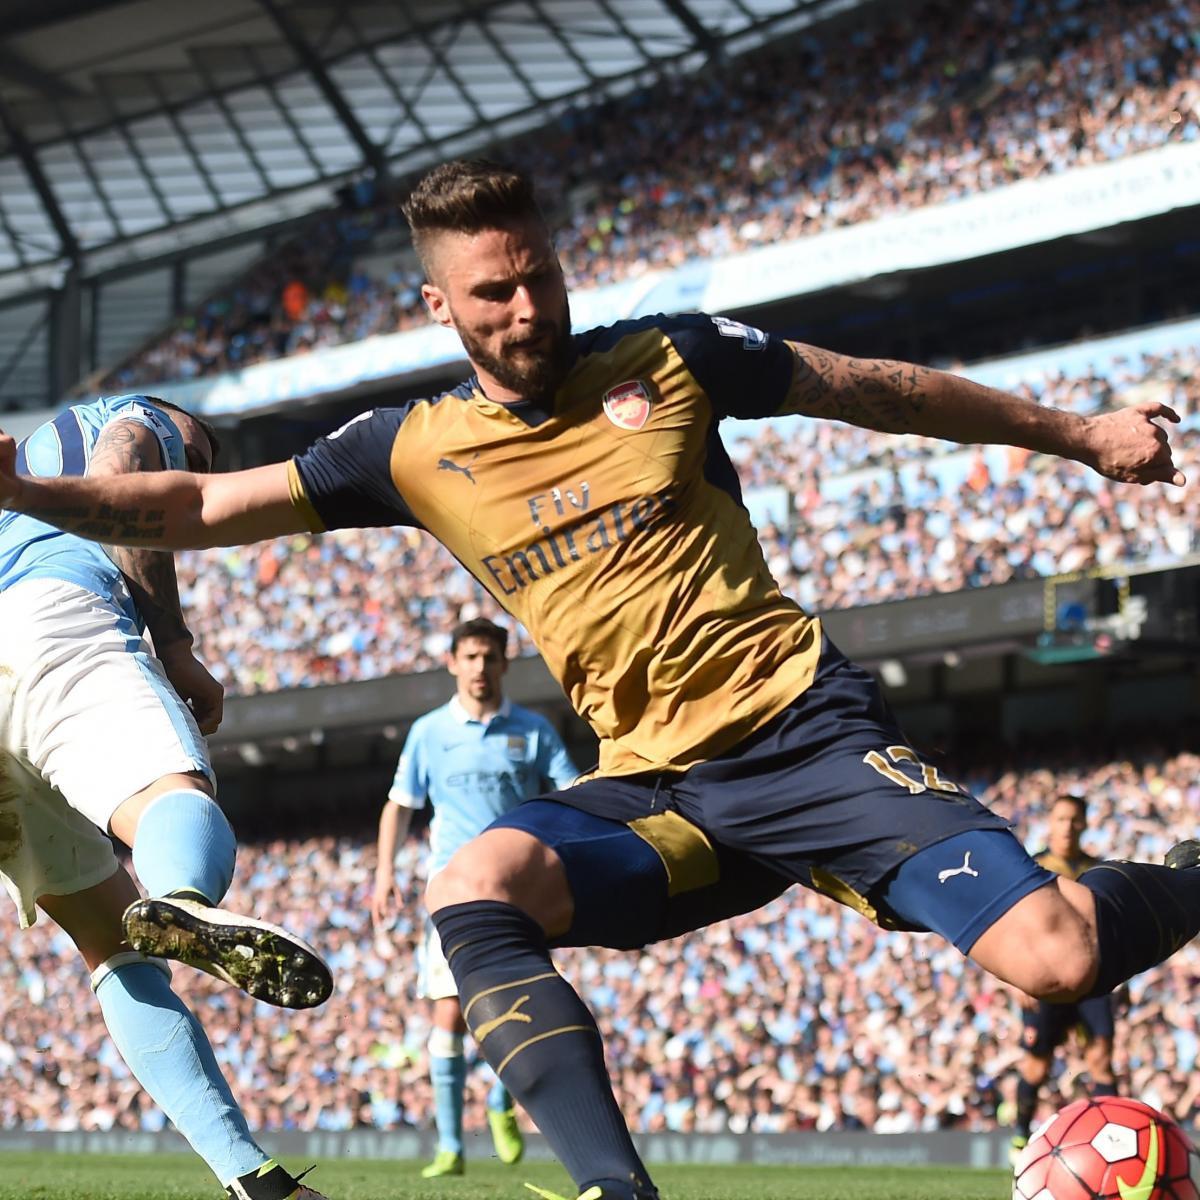 Arsenal Vs Tottenham Live Score Highlights From Premier: Arsenal Vs. Aston Villa: Live Score, Highlights From